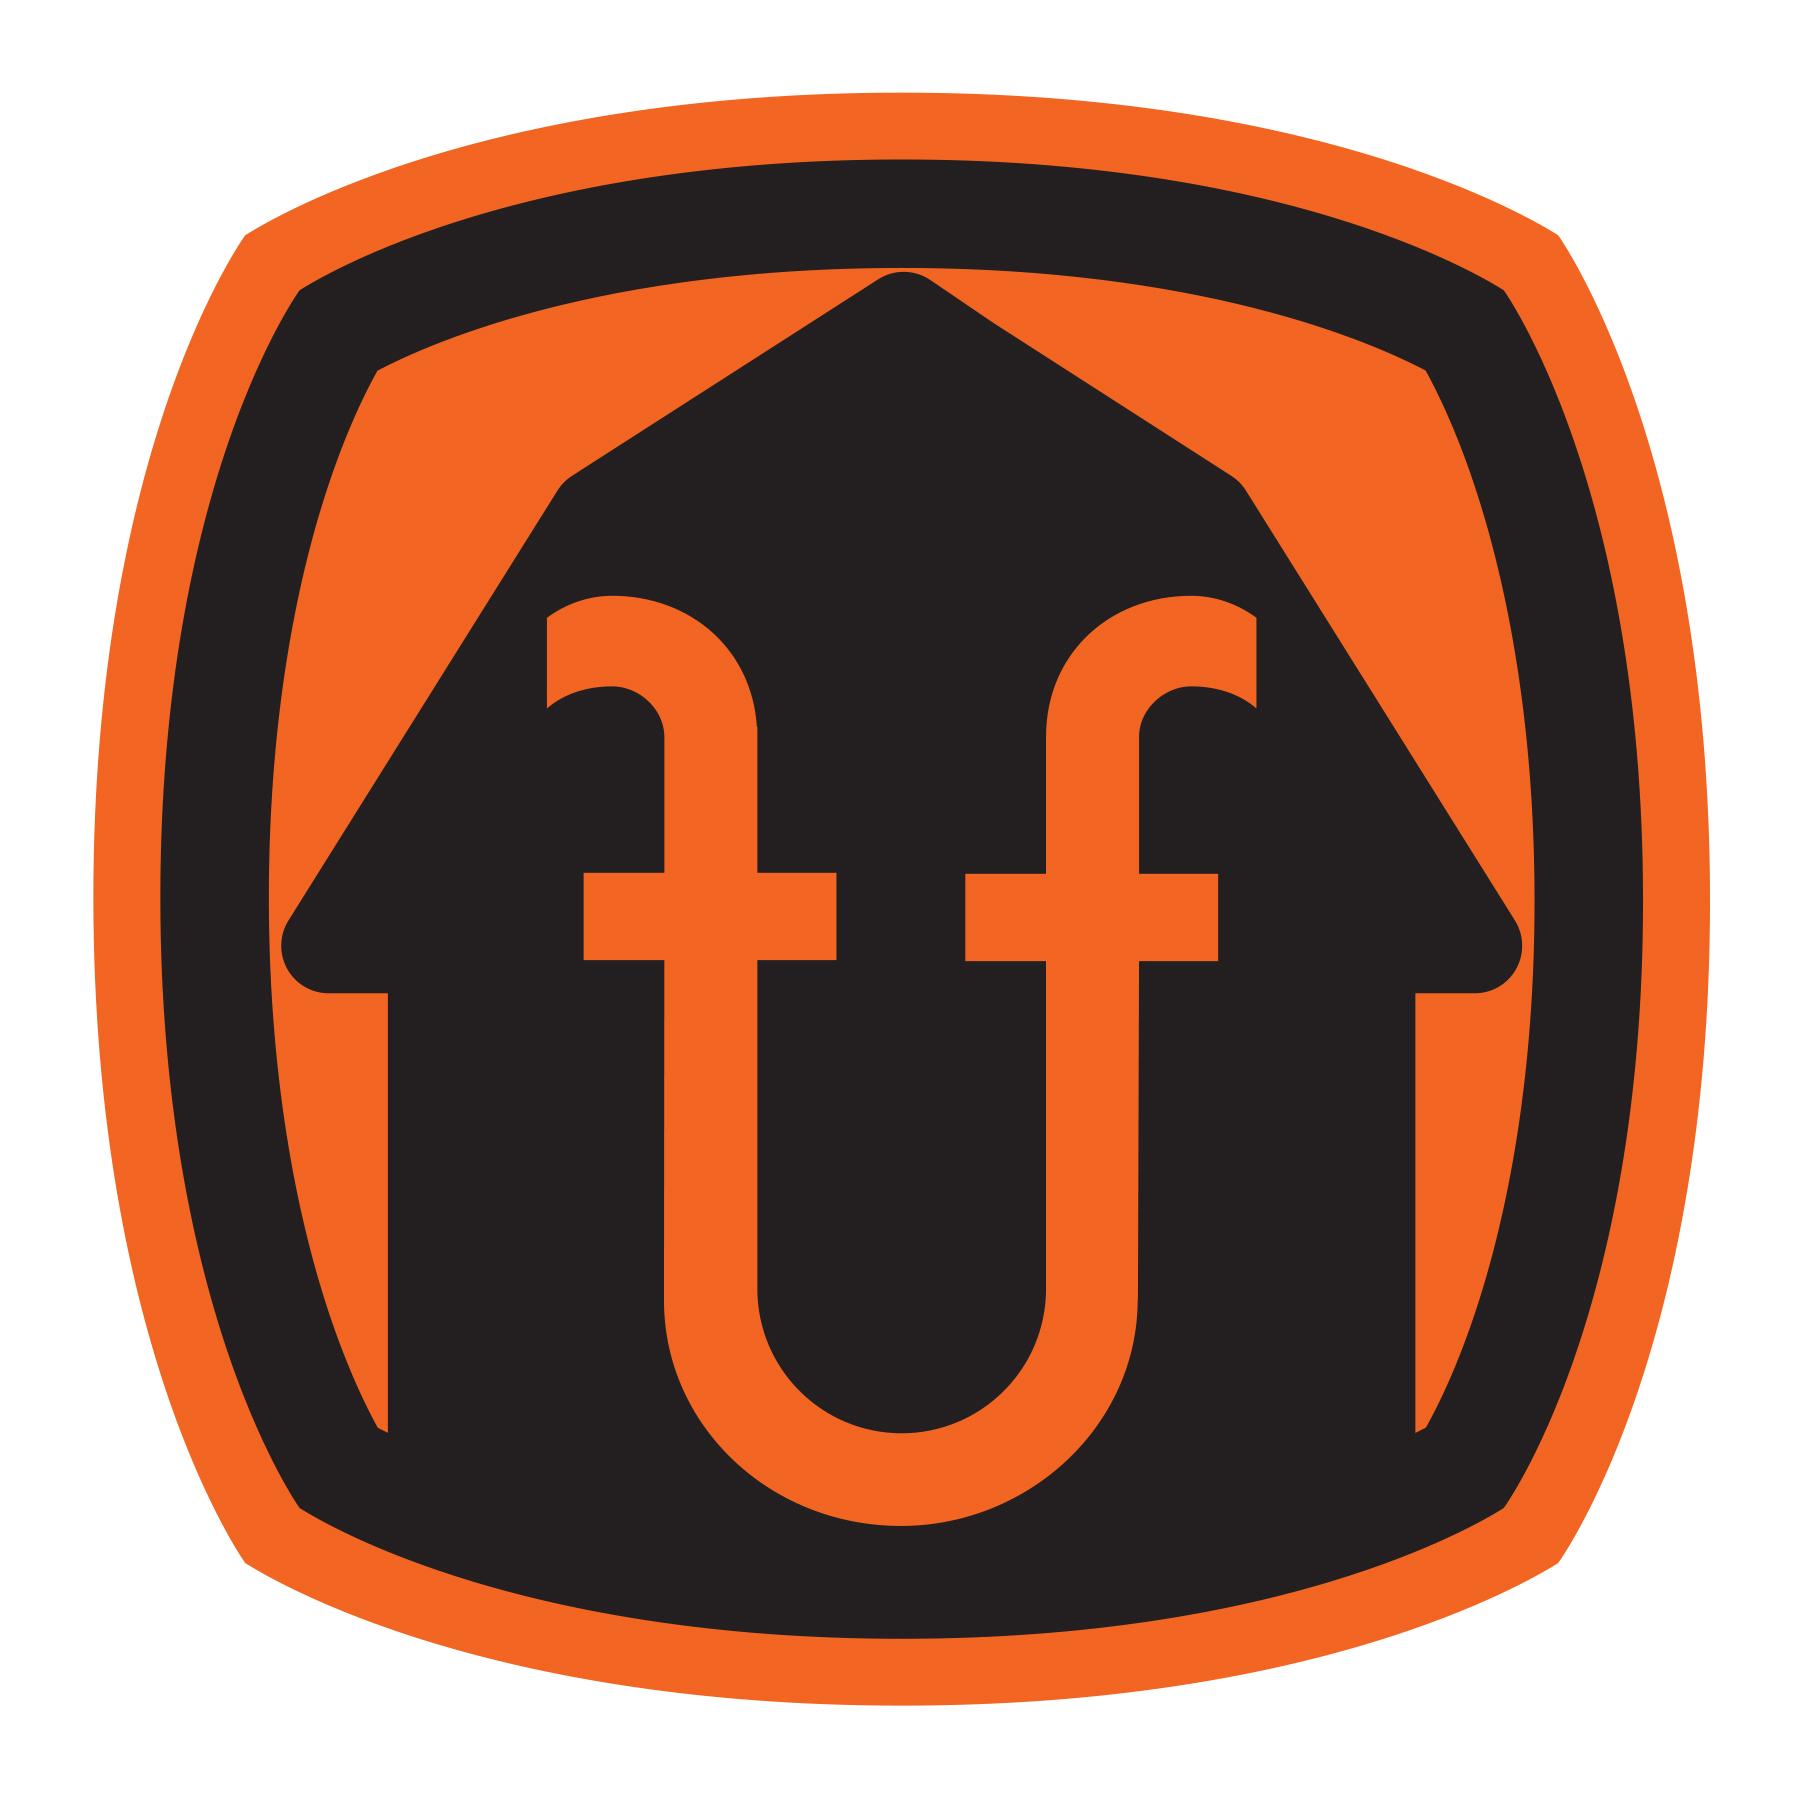 tacofarm - logo only.jpg